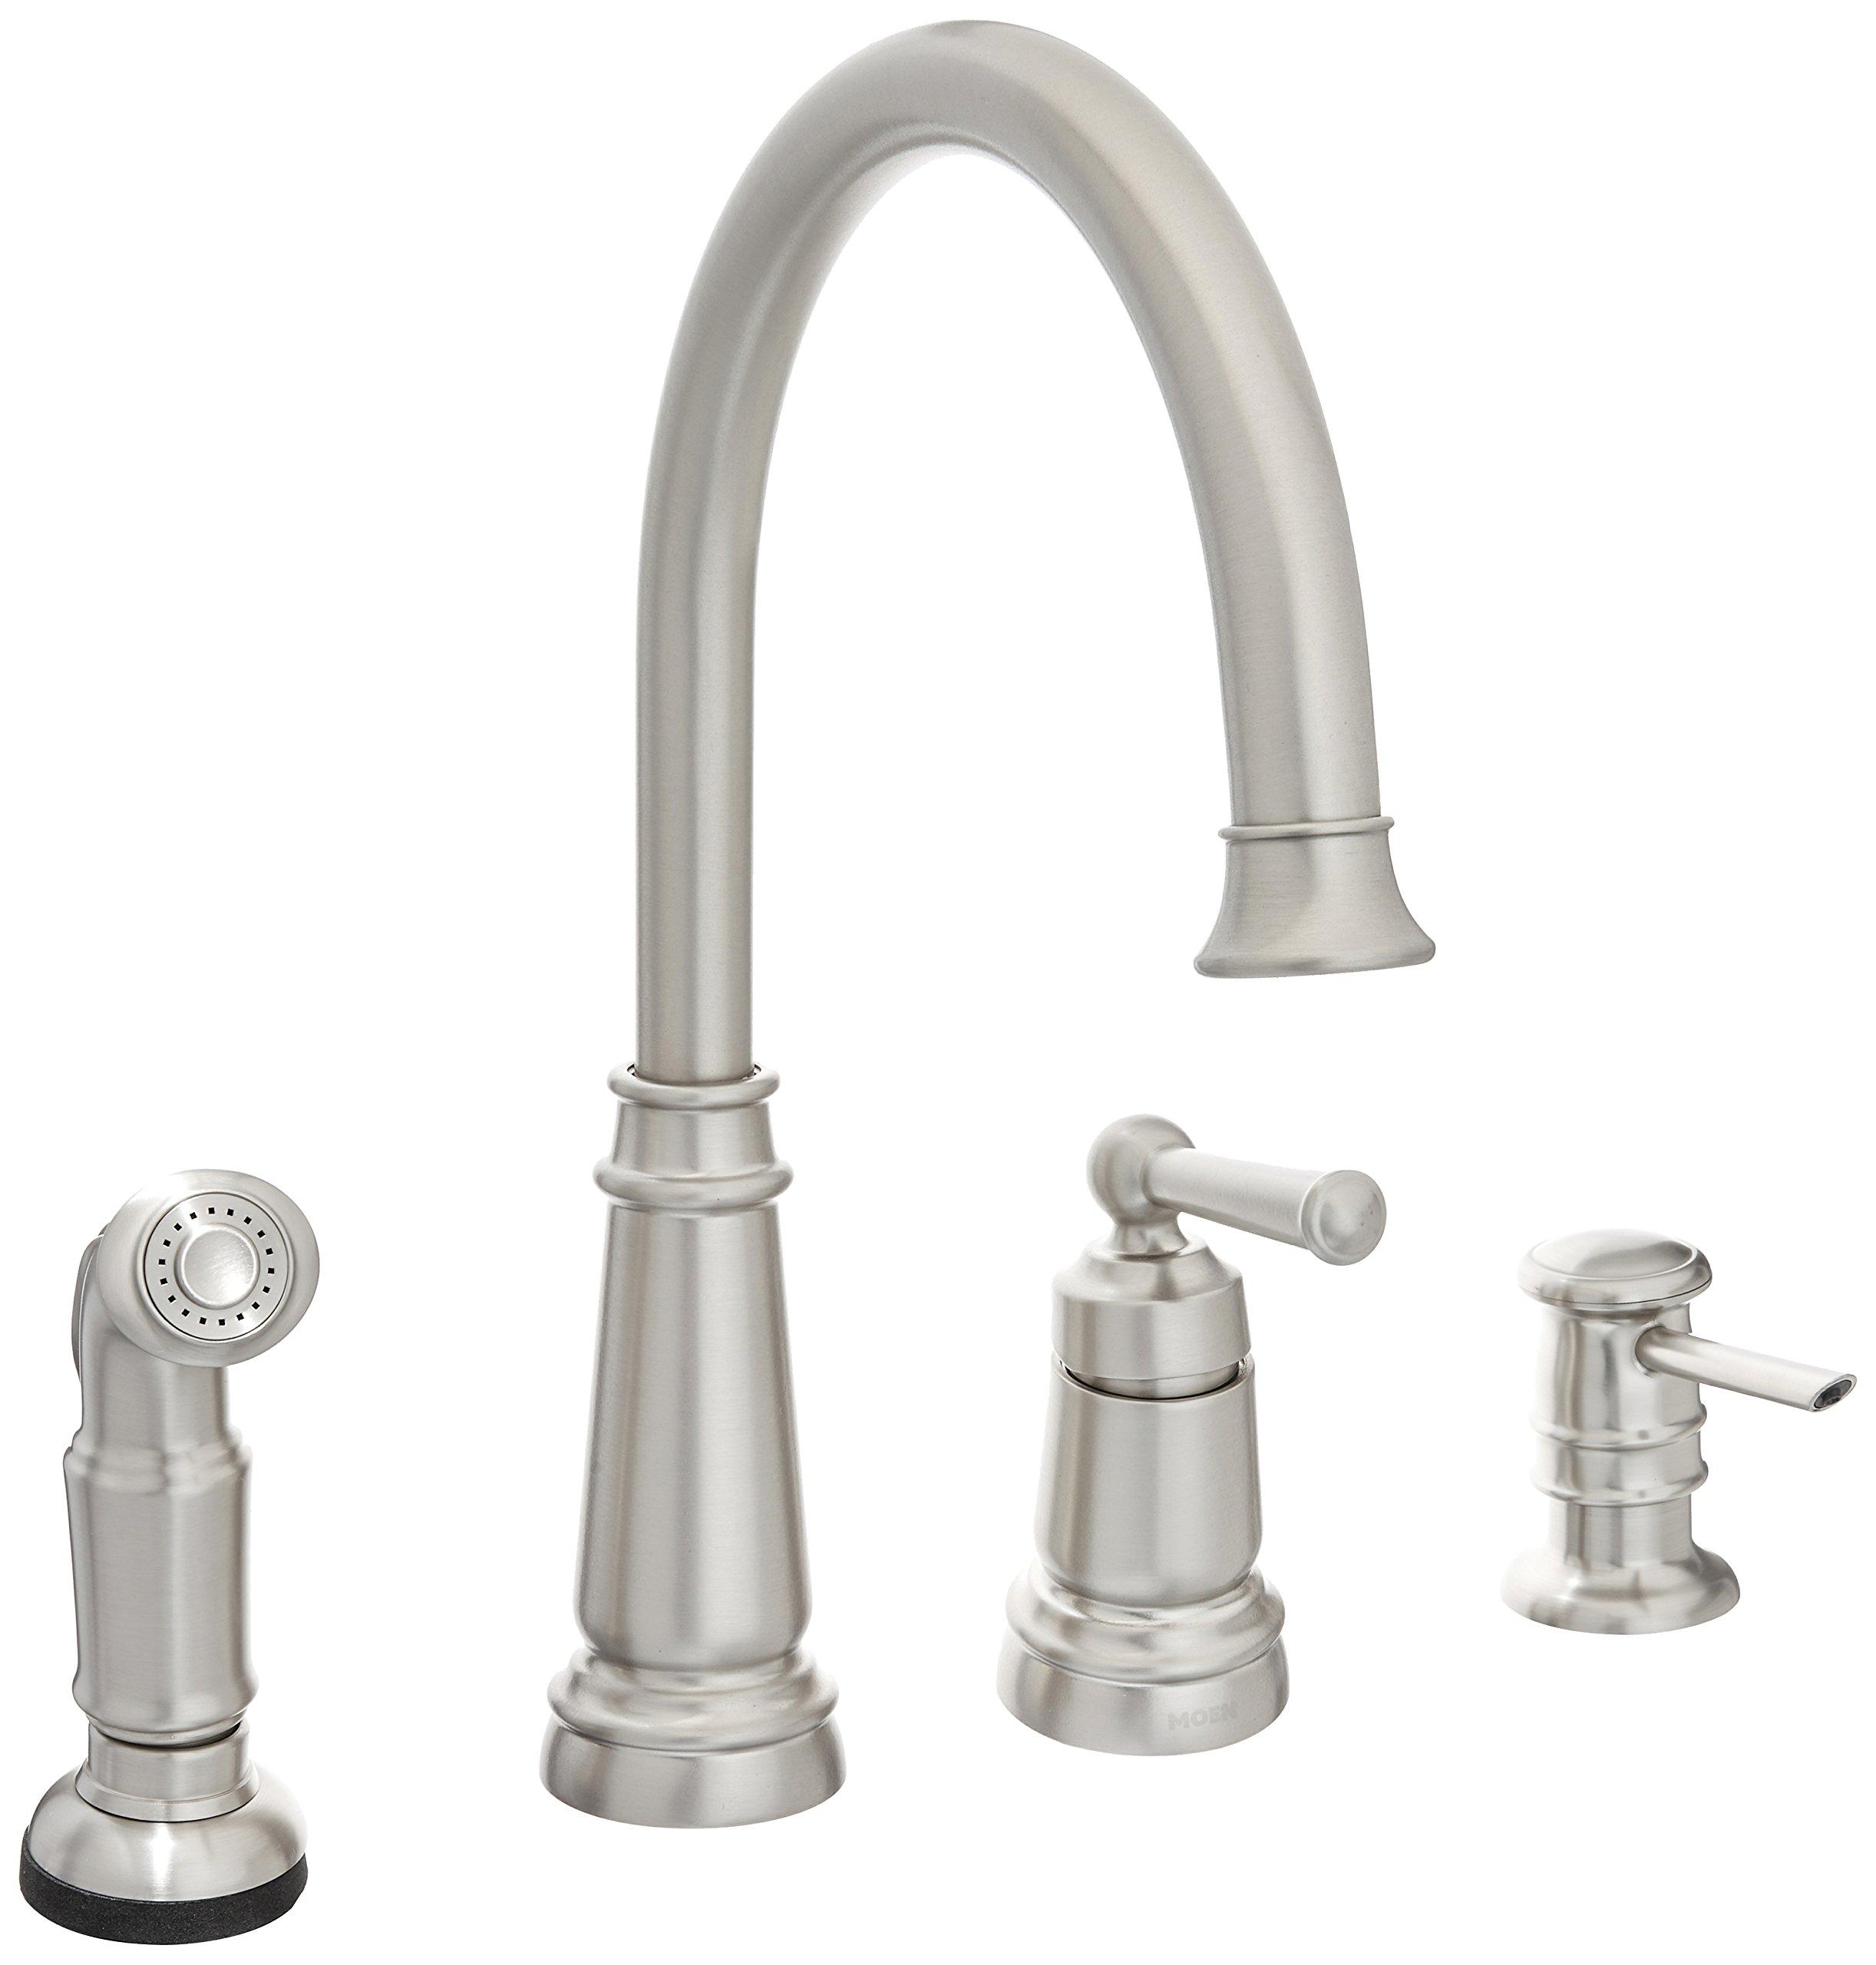 Moen 87042srs One Handle High Arc Kitchen Faucet Spot Resist Stainless Amazon Com